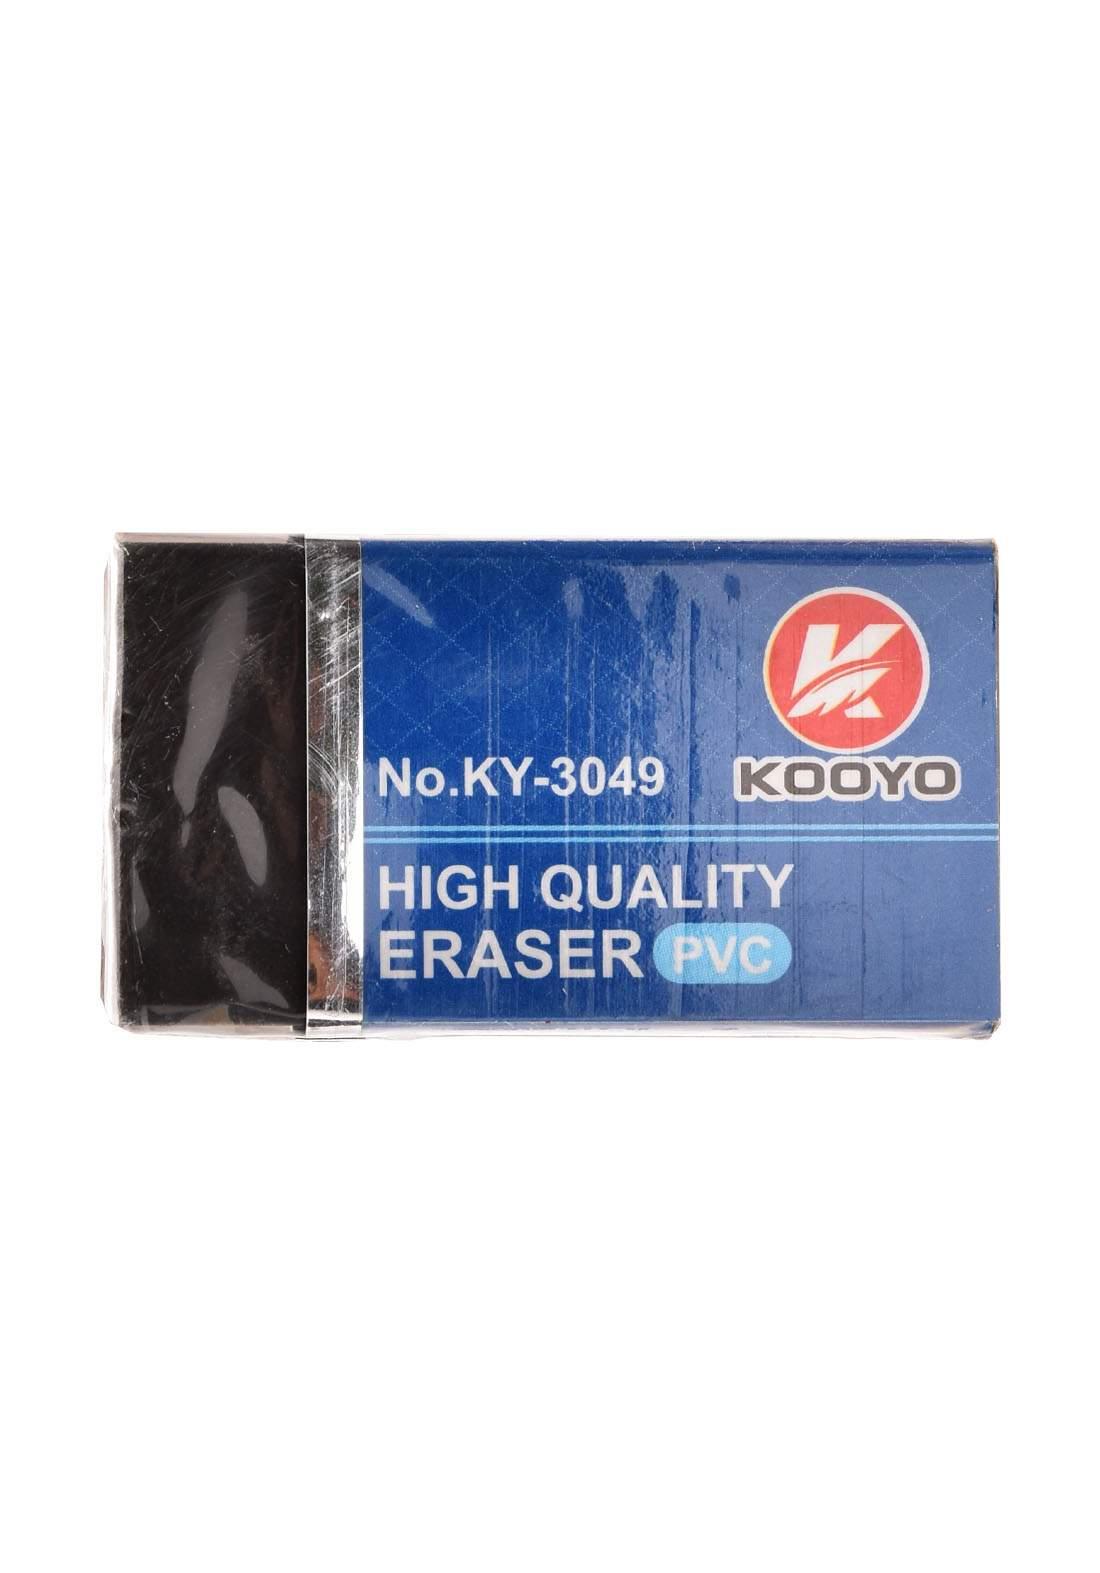 Kooyo KY-3049 ممحاة لقلم الرصاص